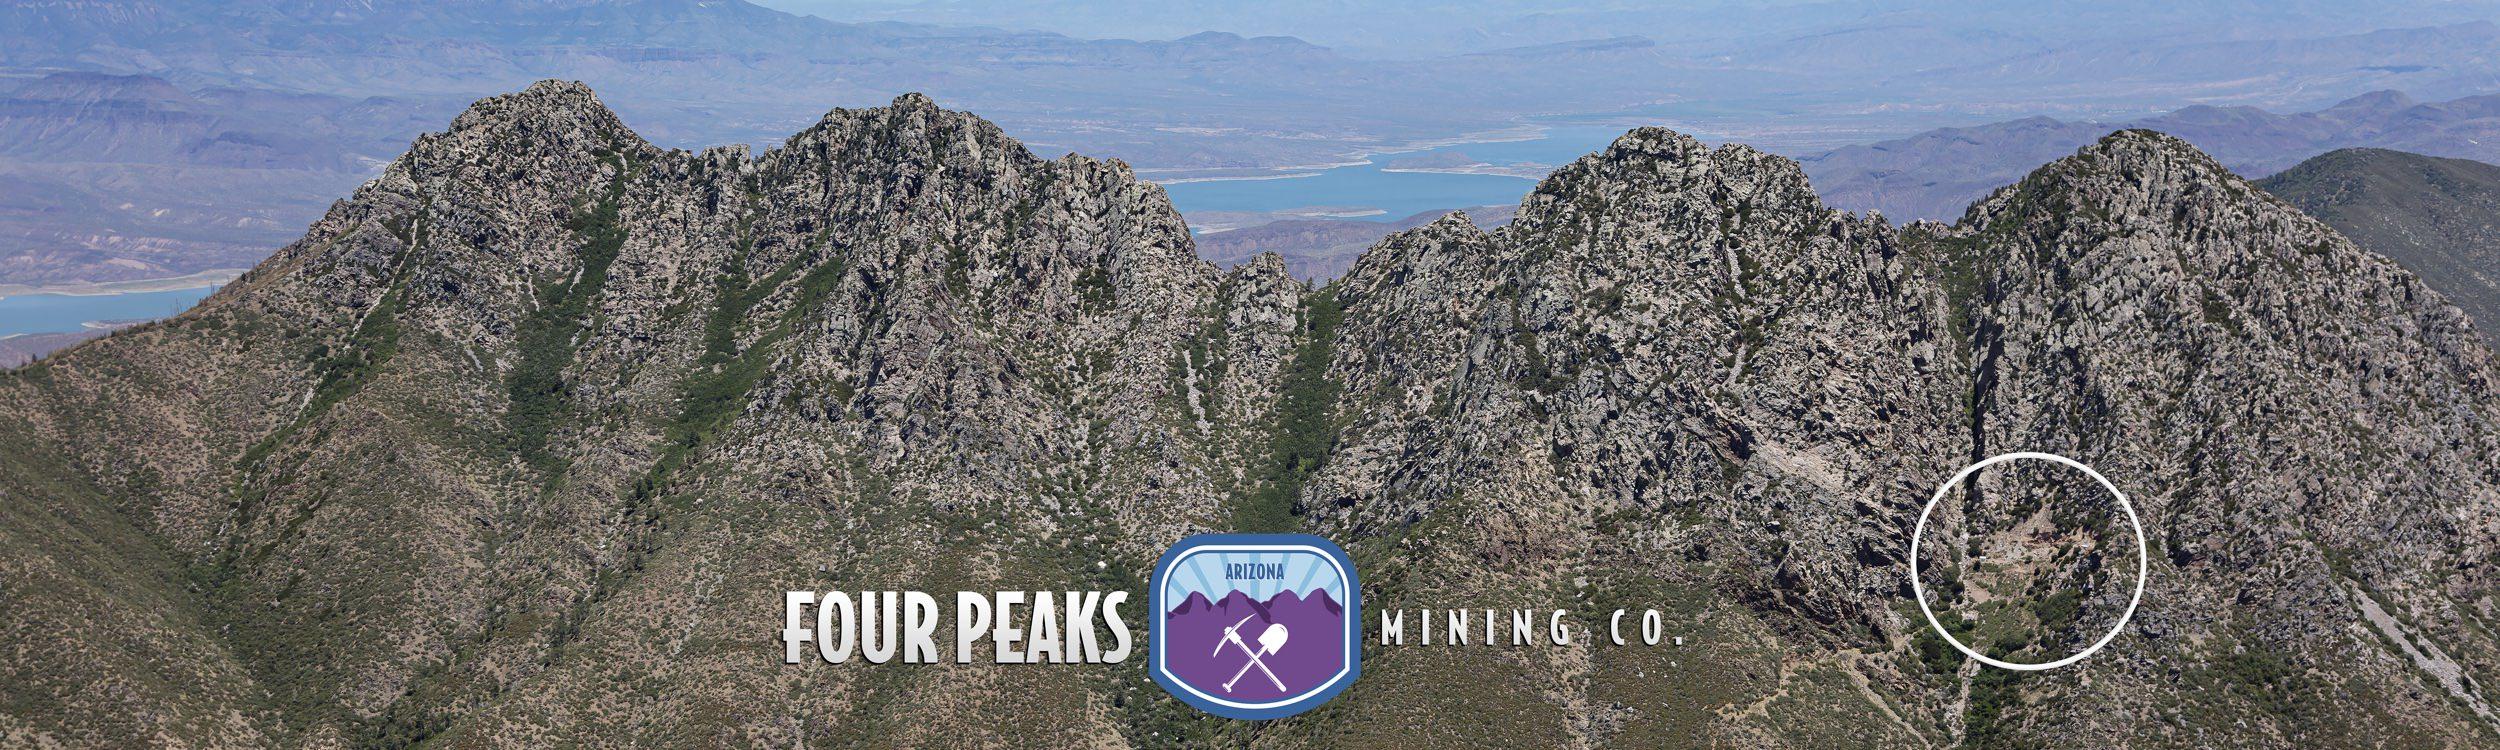 four-peaks-mining-co-hero-1